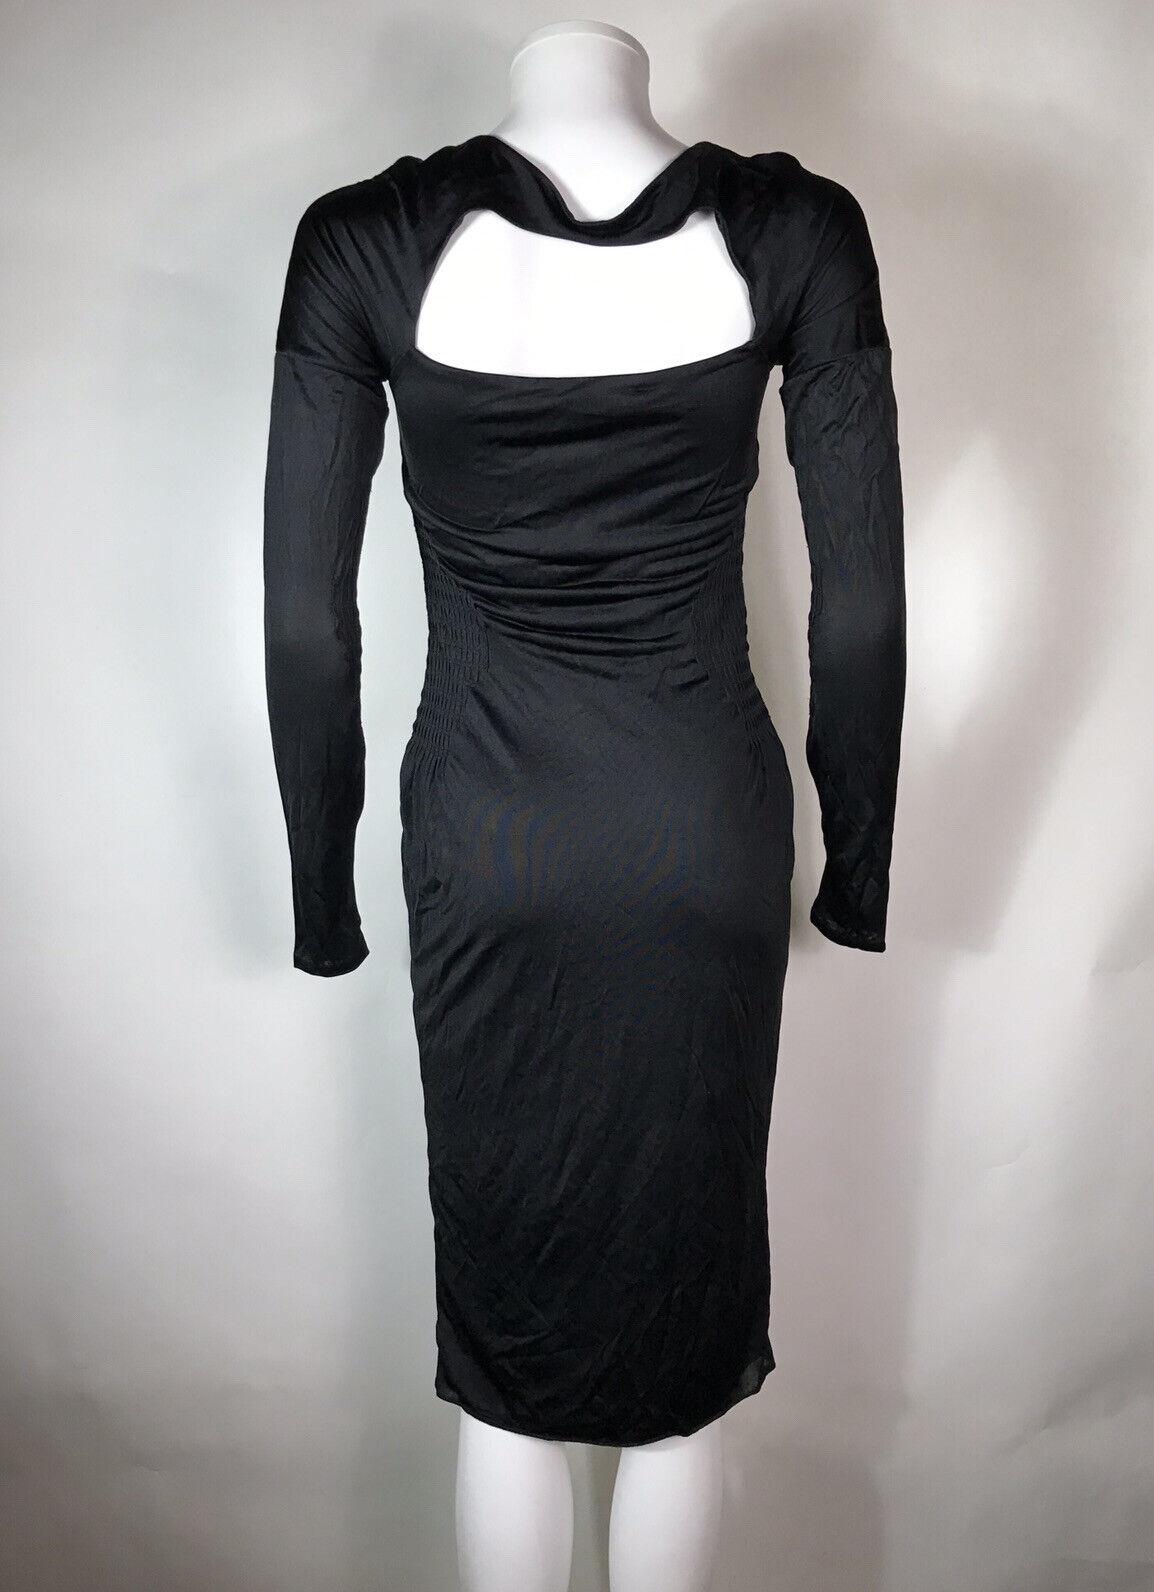 Rare Vtg Gucci Black Cut Out Dress S - image 5